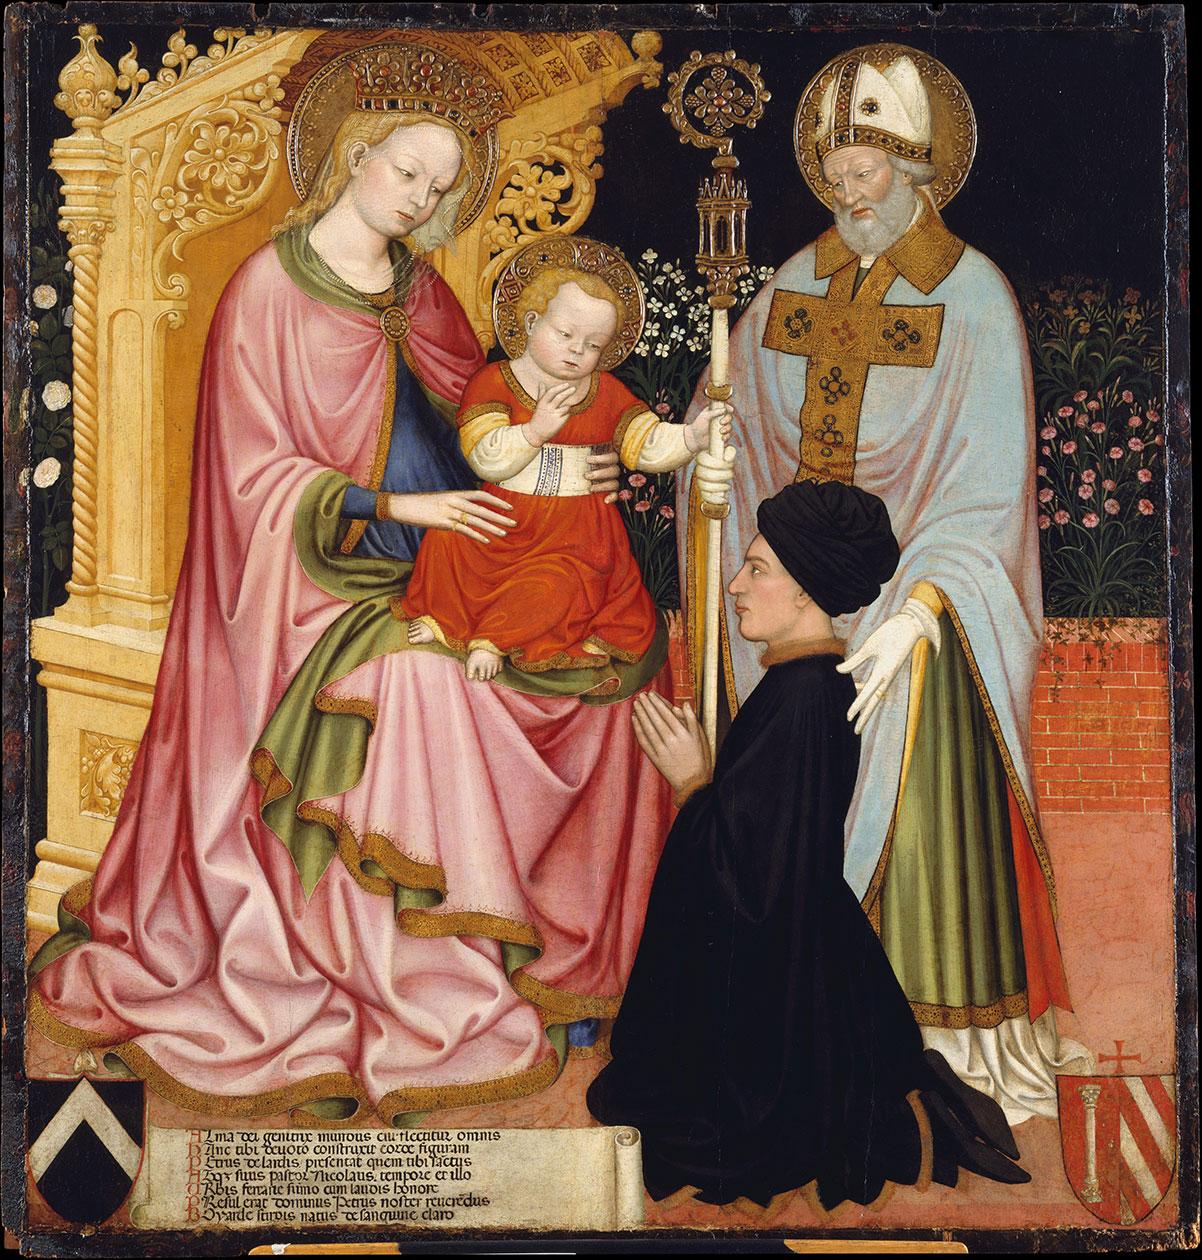 Madonna and Child with the Donor, Pietro de' Lardi, Presented by Saint Nicholas - dai Carri